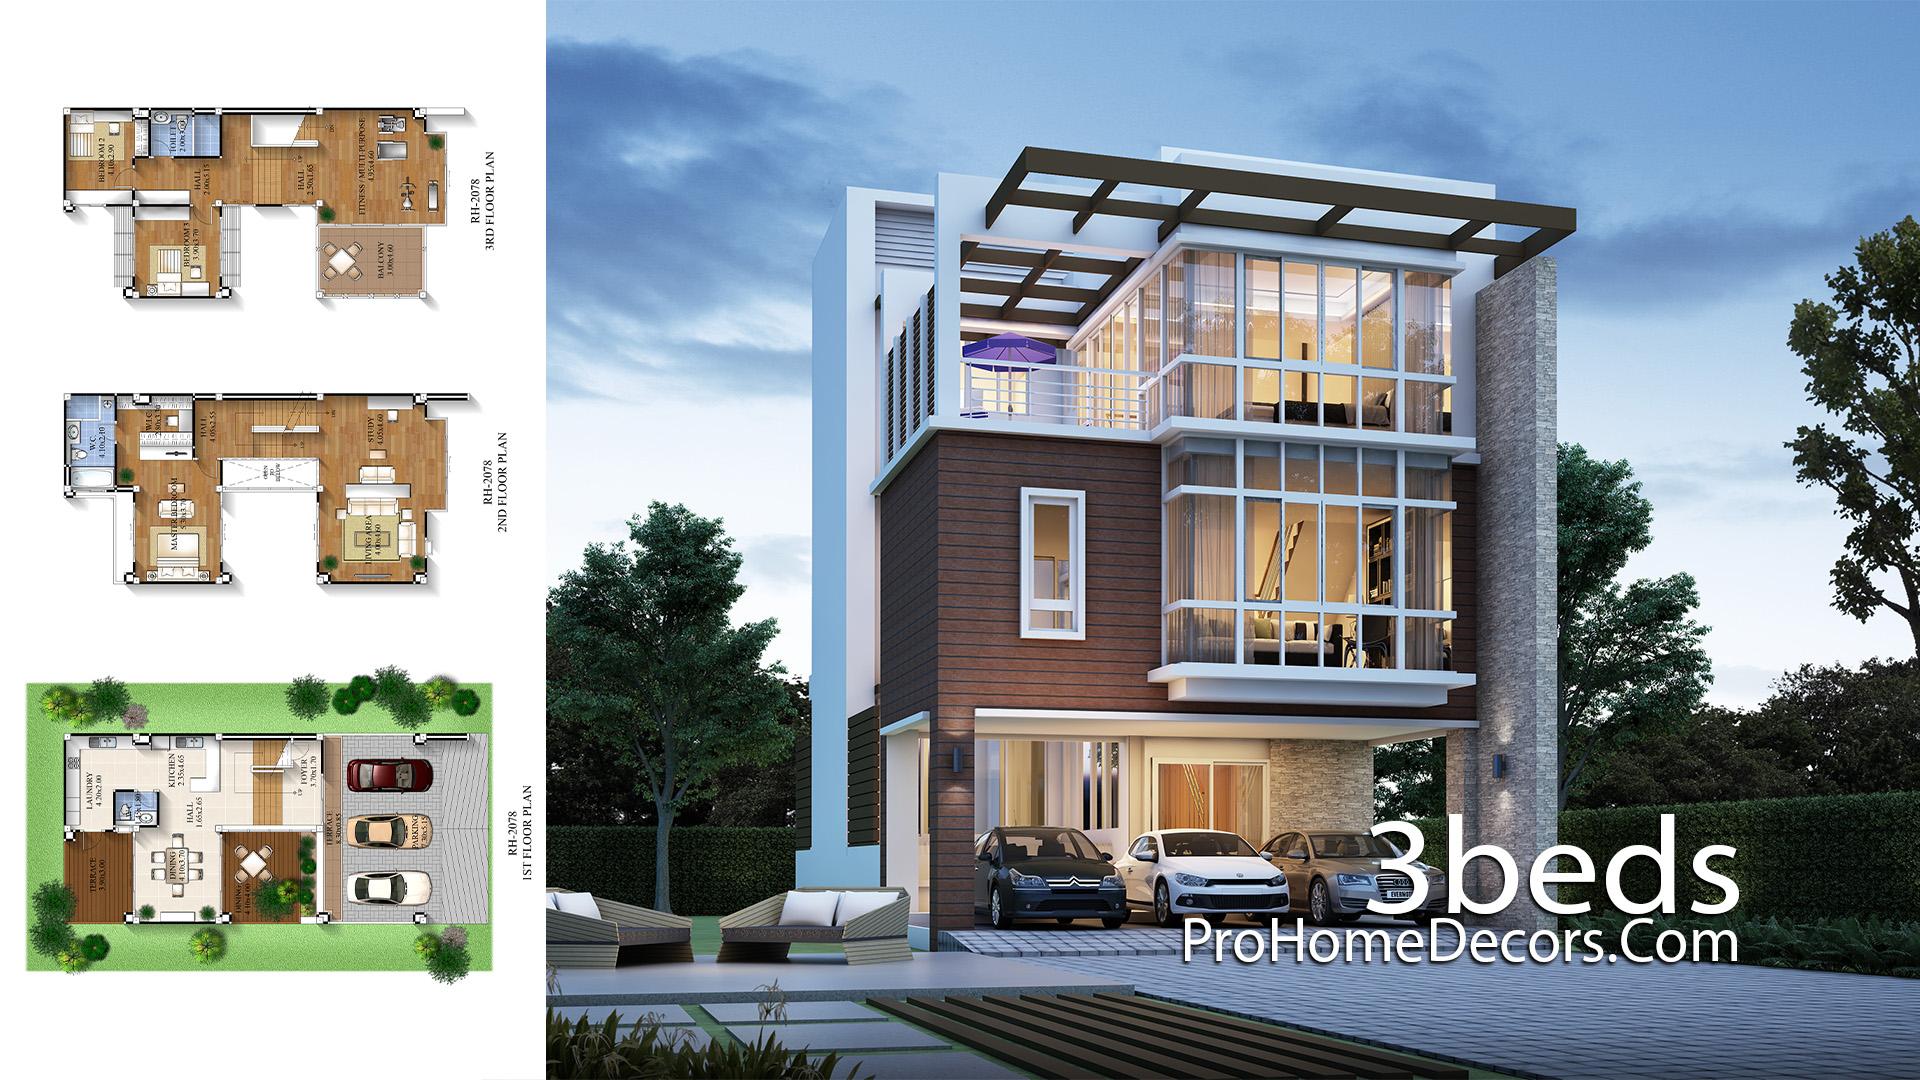 House Design Plan 8x15.5 meter with 3 Bedrooms